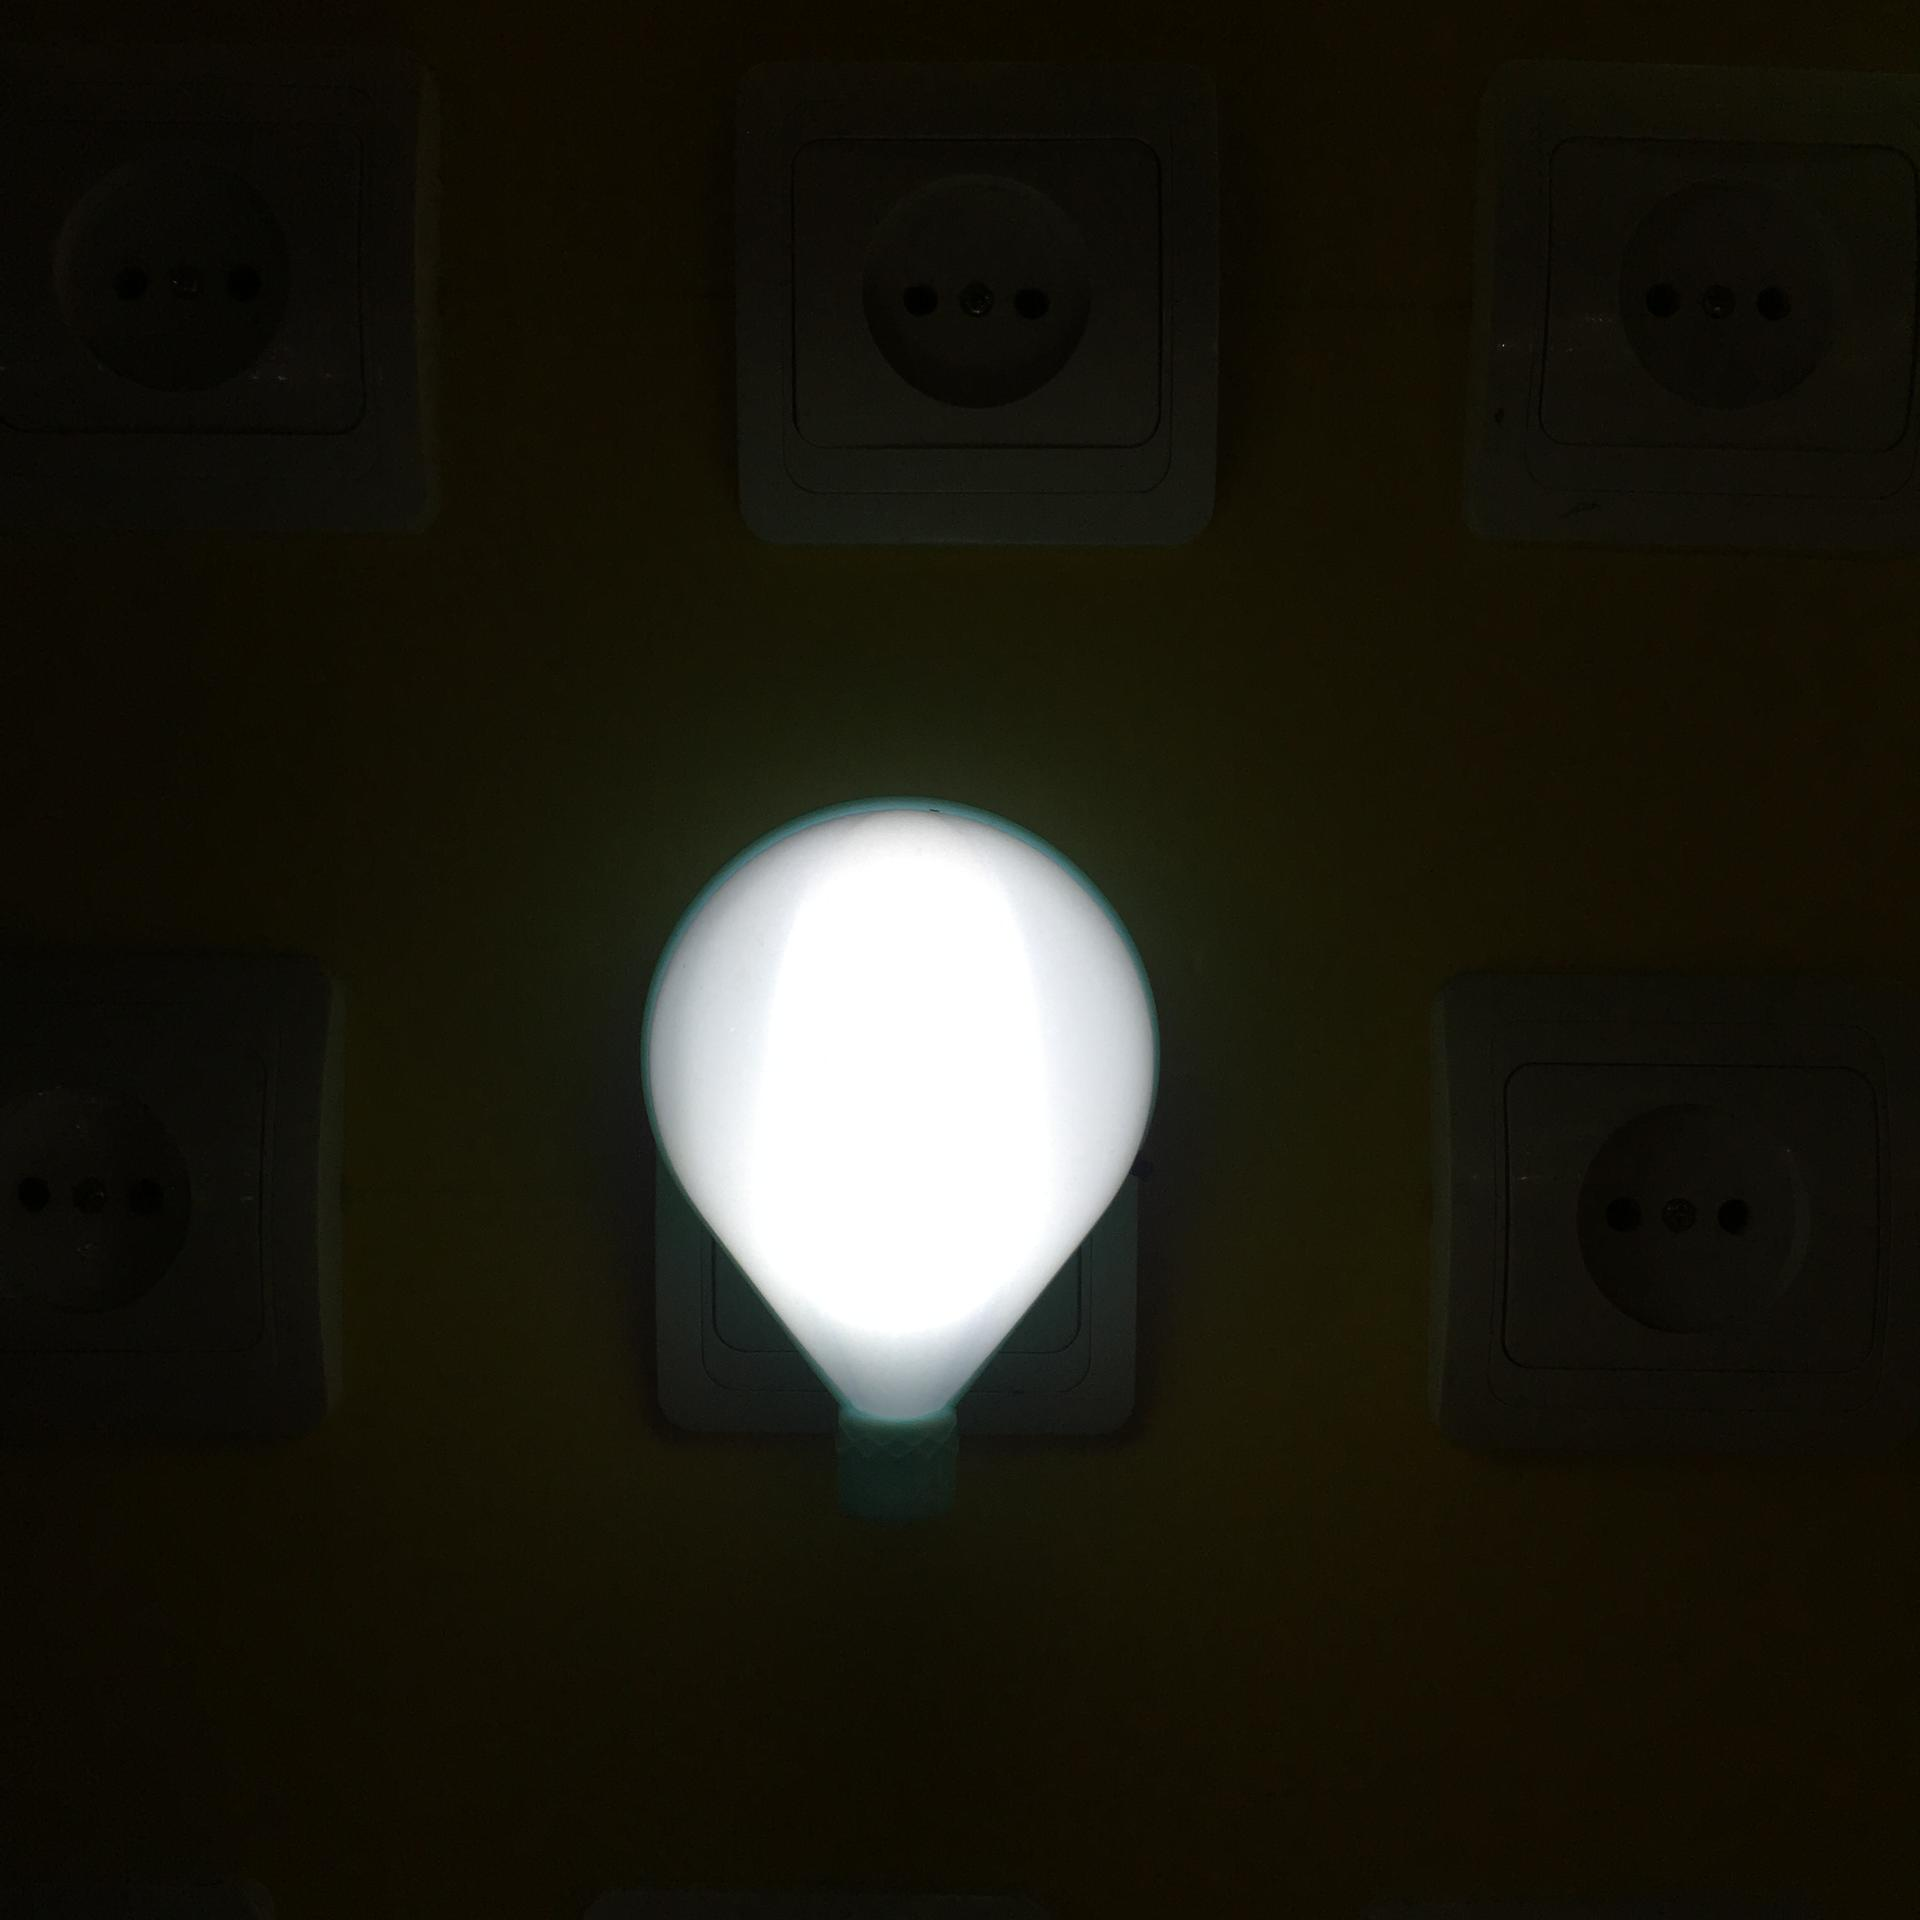 OEM night light 0.6W AC 110V 220V W043 Fire balloon shape 3 SMD mini switch plug in